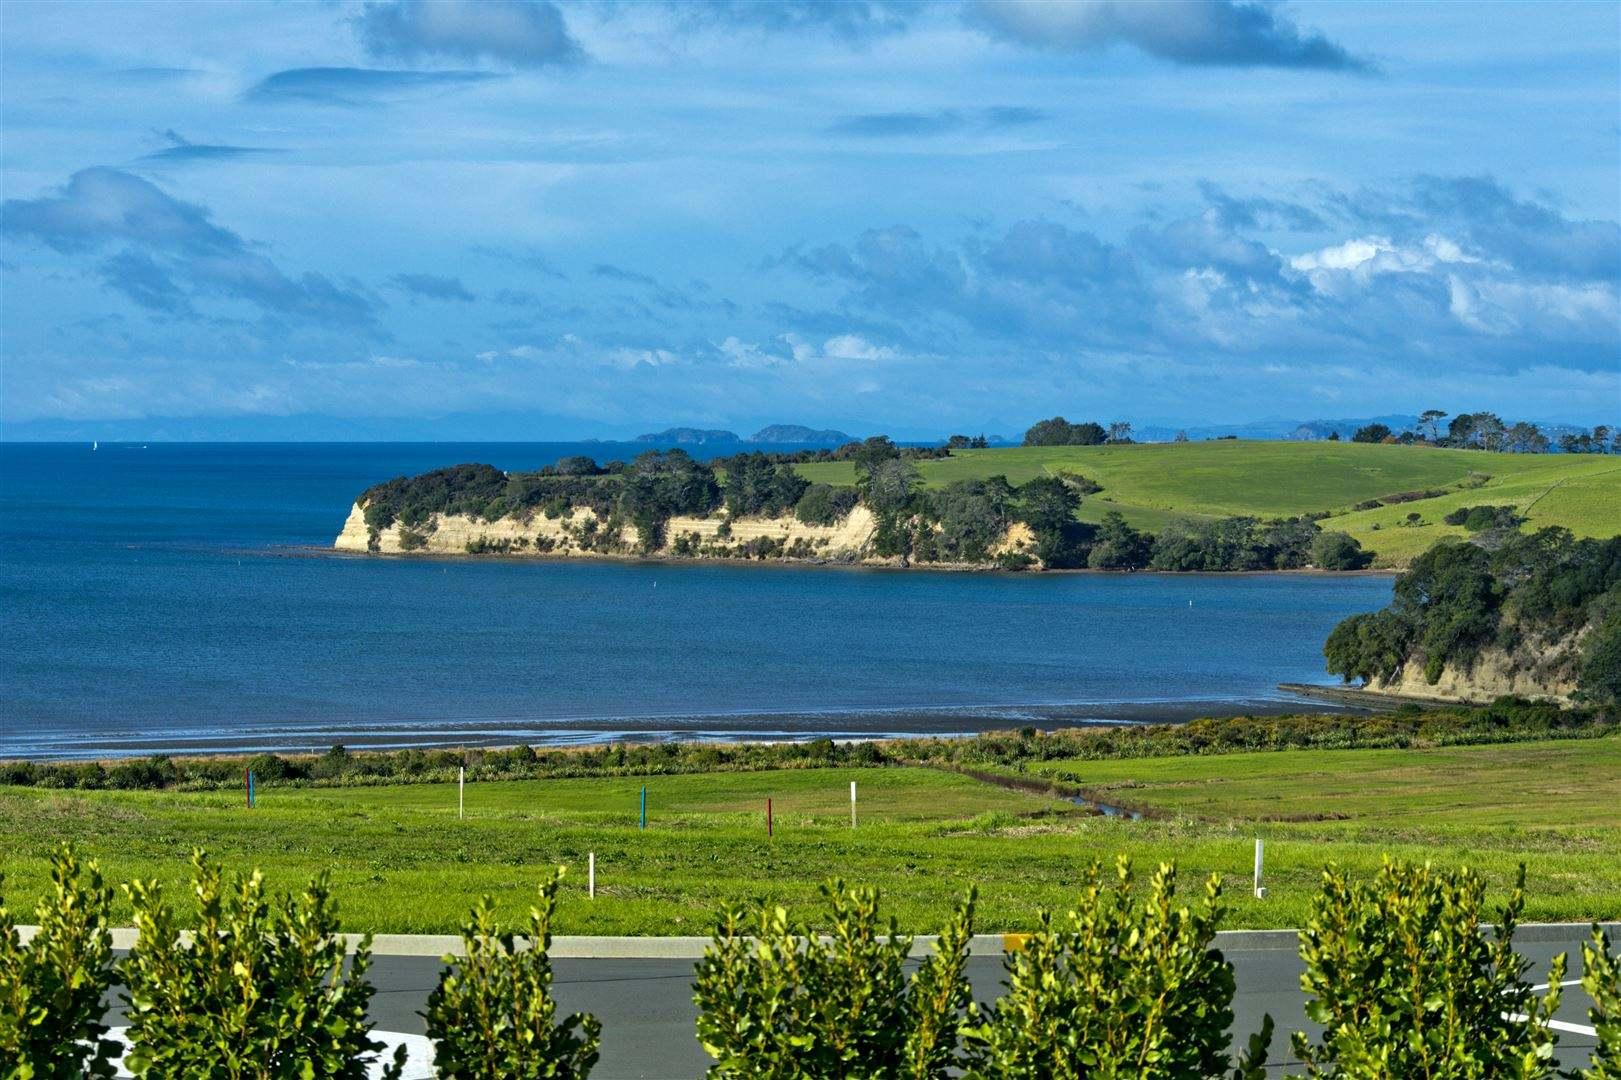 Redvale 4房 顶级海滨地标宅邸 美学与品质的结合 远眺海岛风光 乐享休闲生活 蓝筹股置业良机! Lifestyle Sensation in a Top Coastal Location